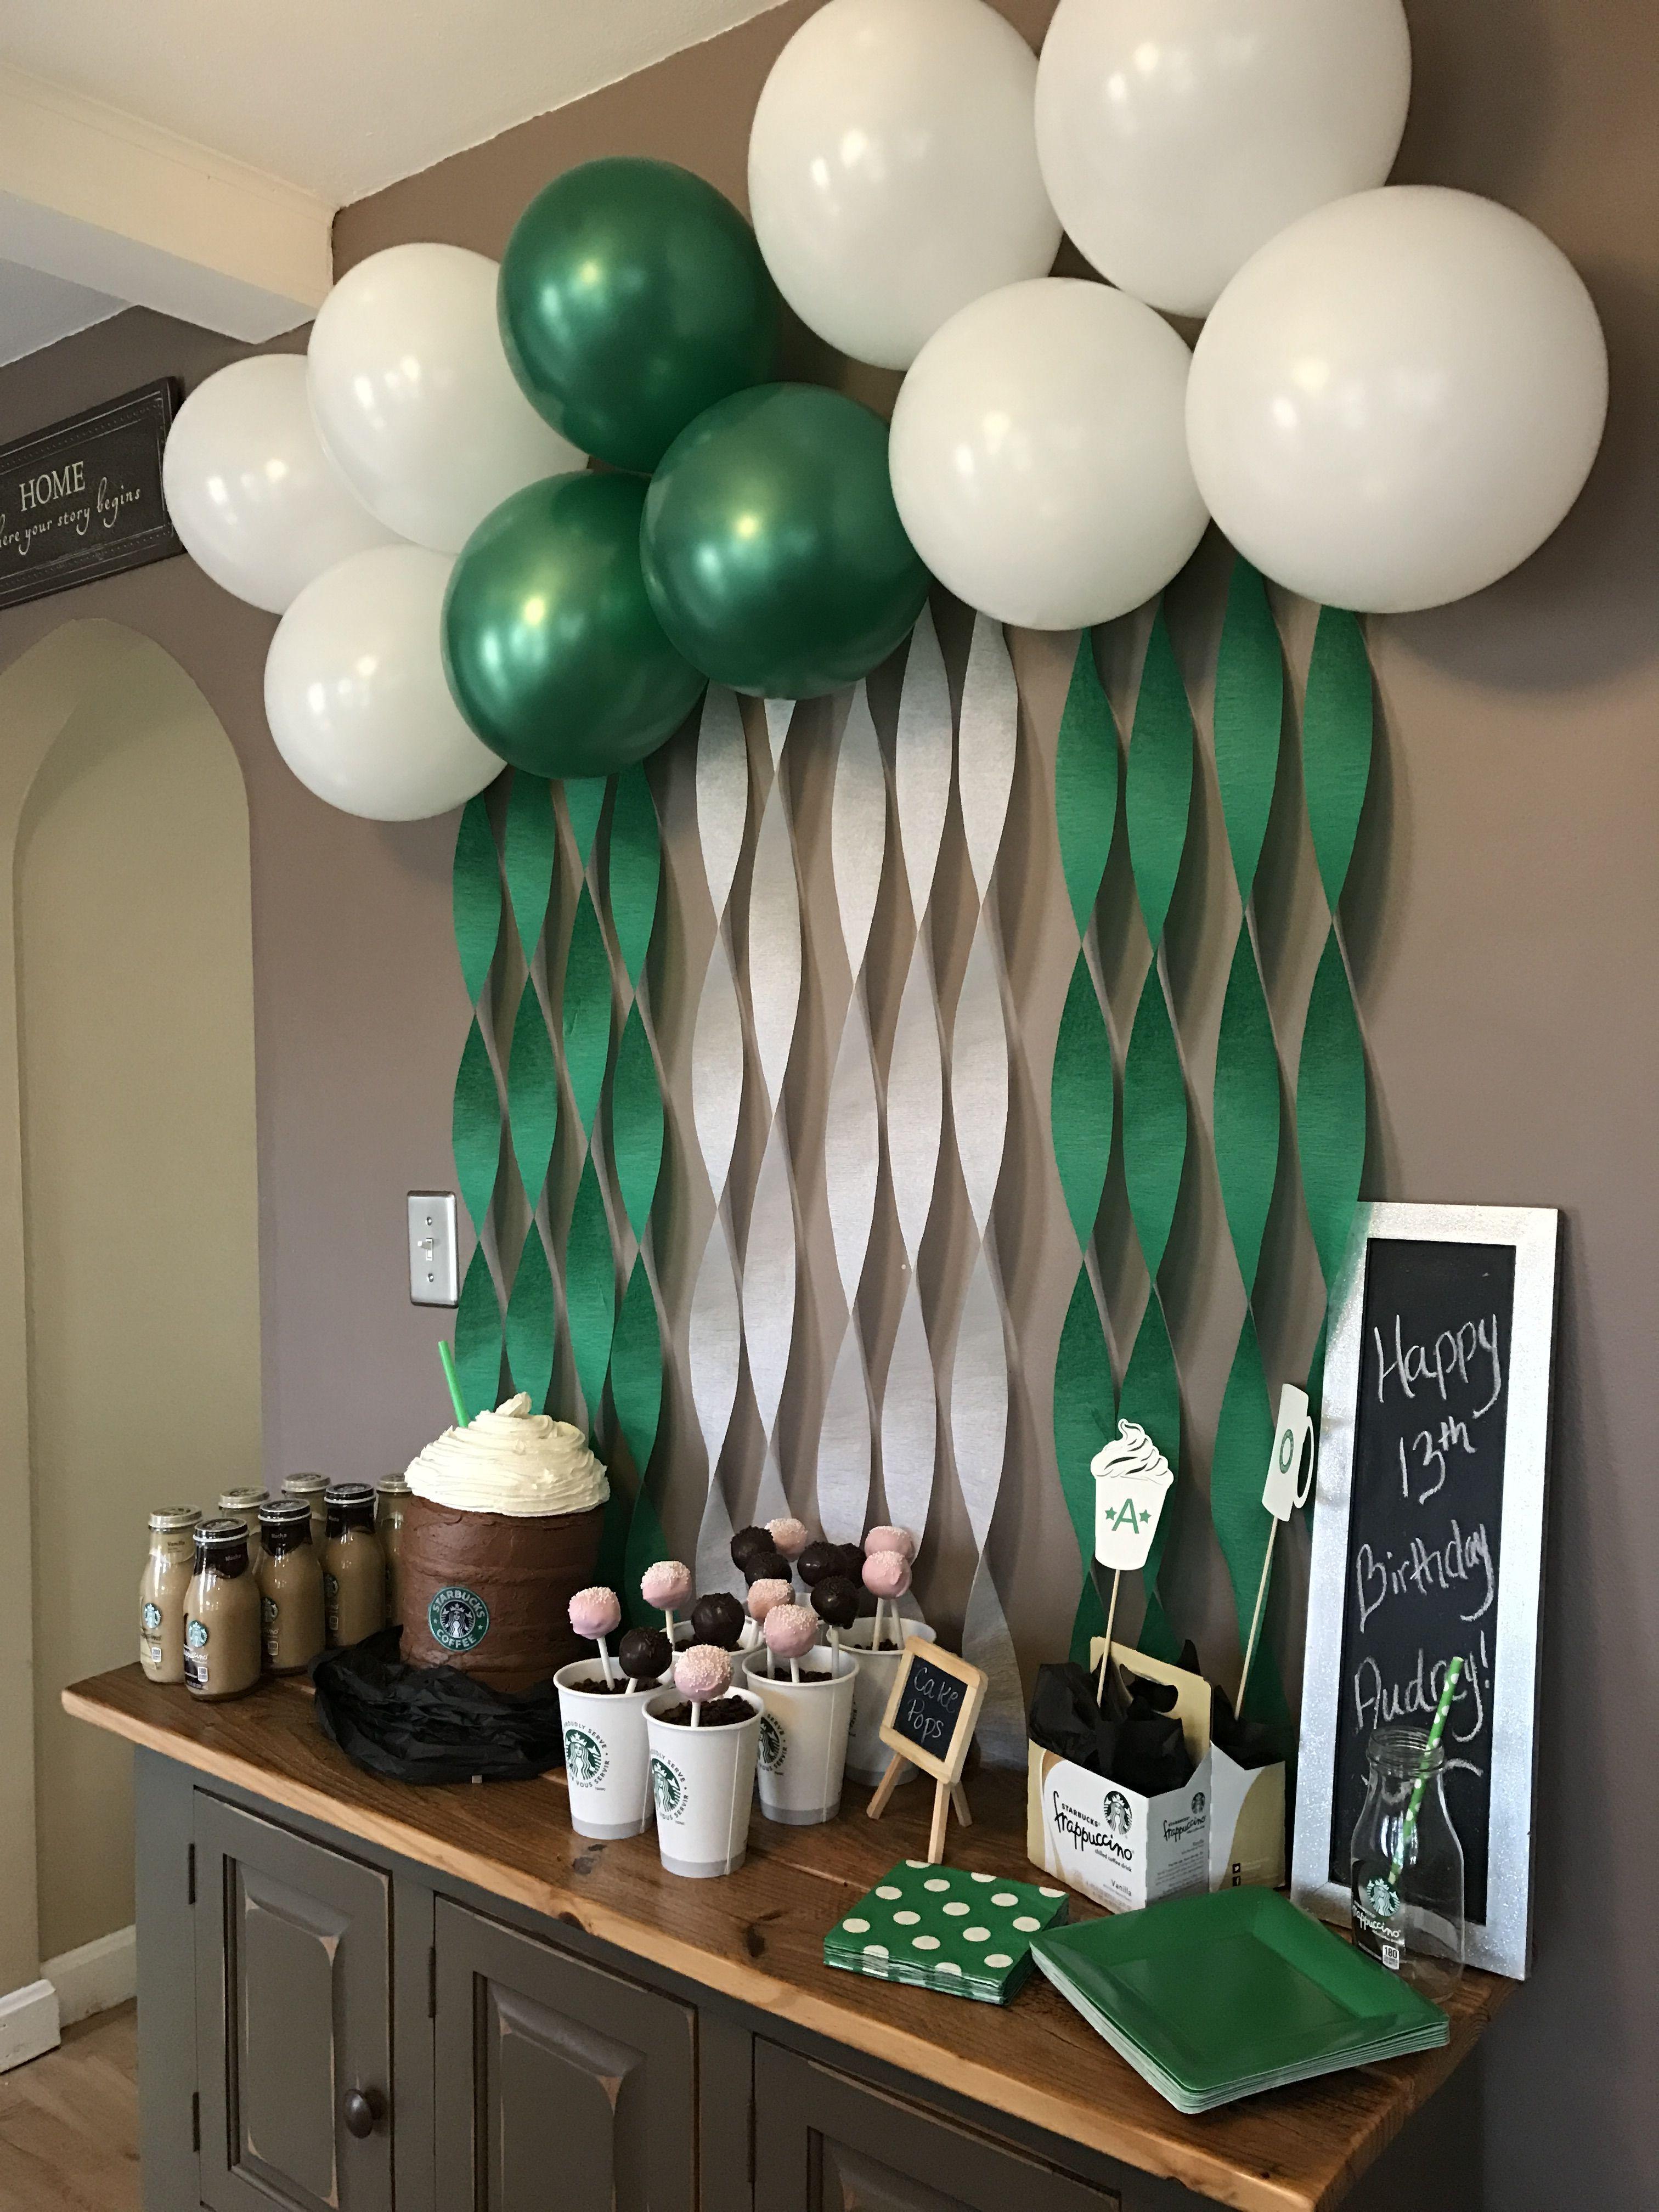 Audrey S 13th Birthday Starbucks Party Audrey S Birthday